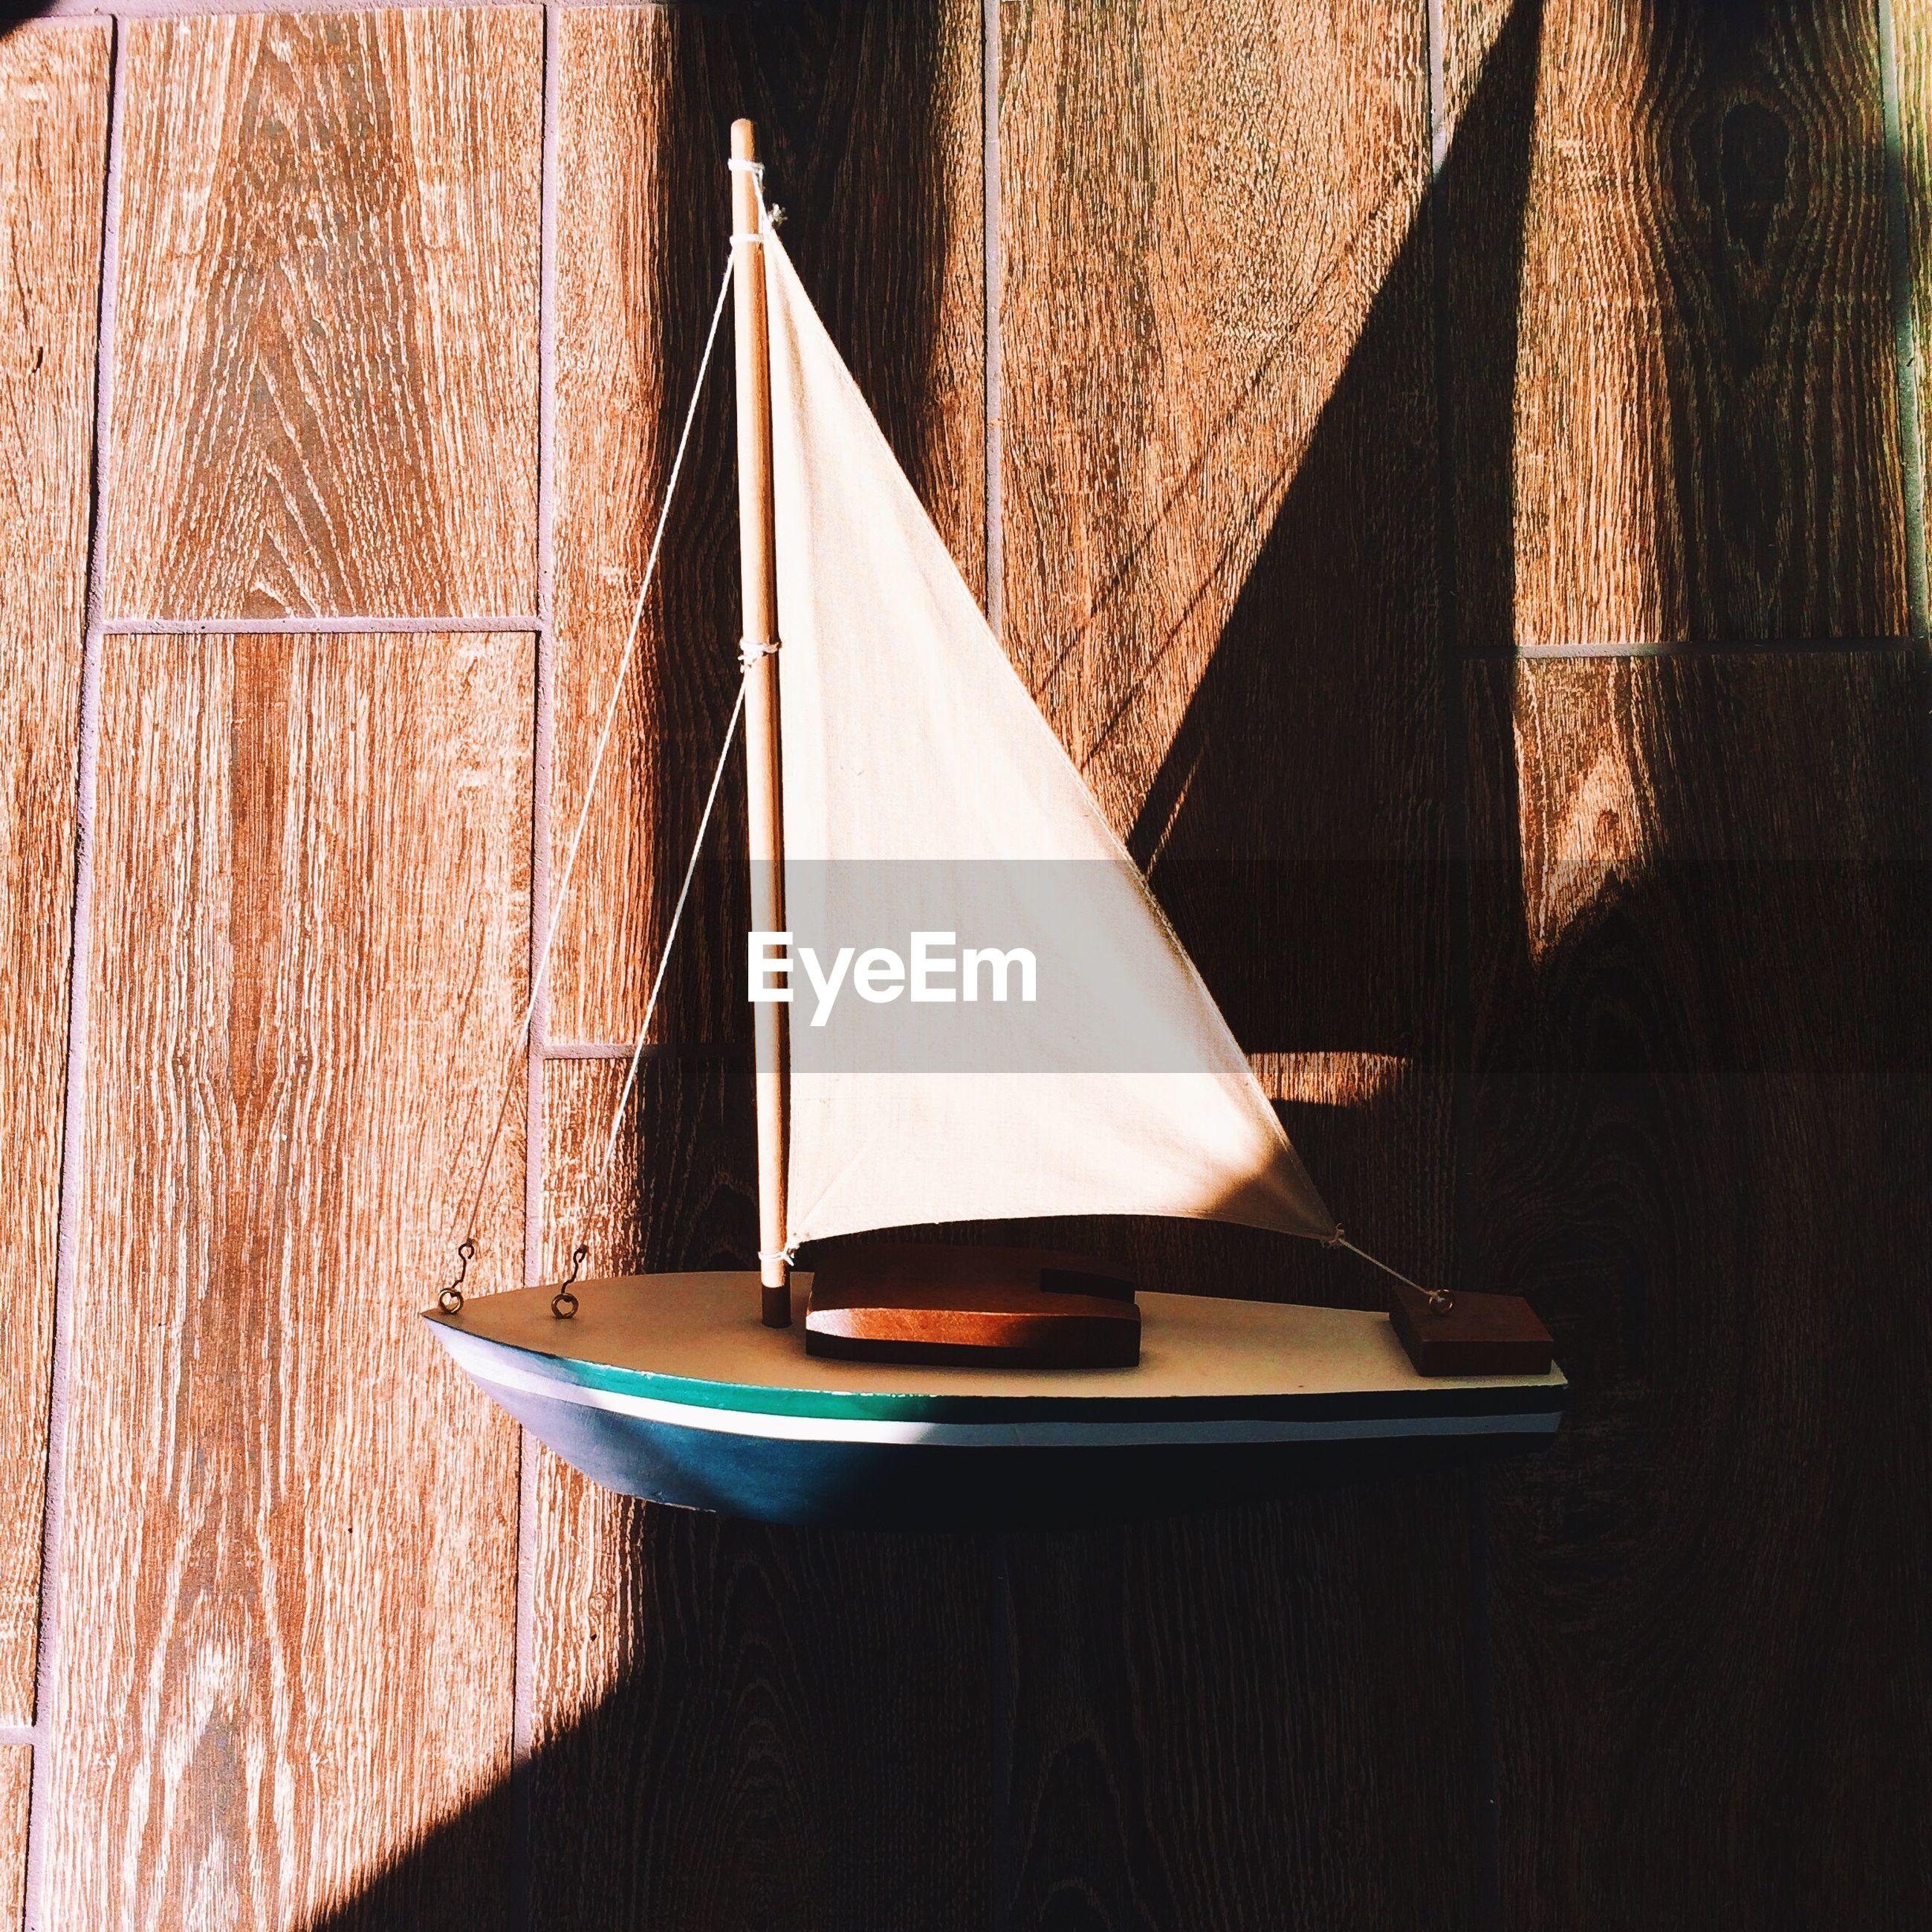 Sunlight falling on boat figurine on table